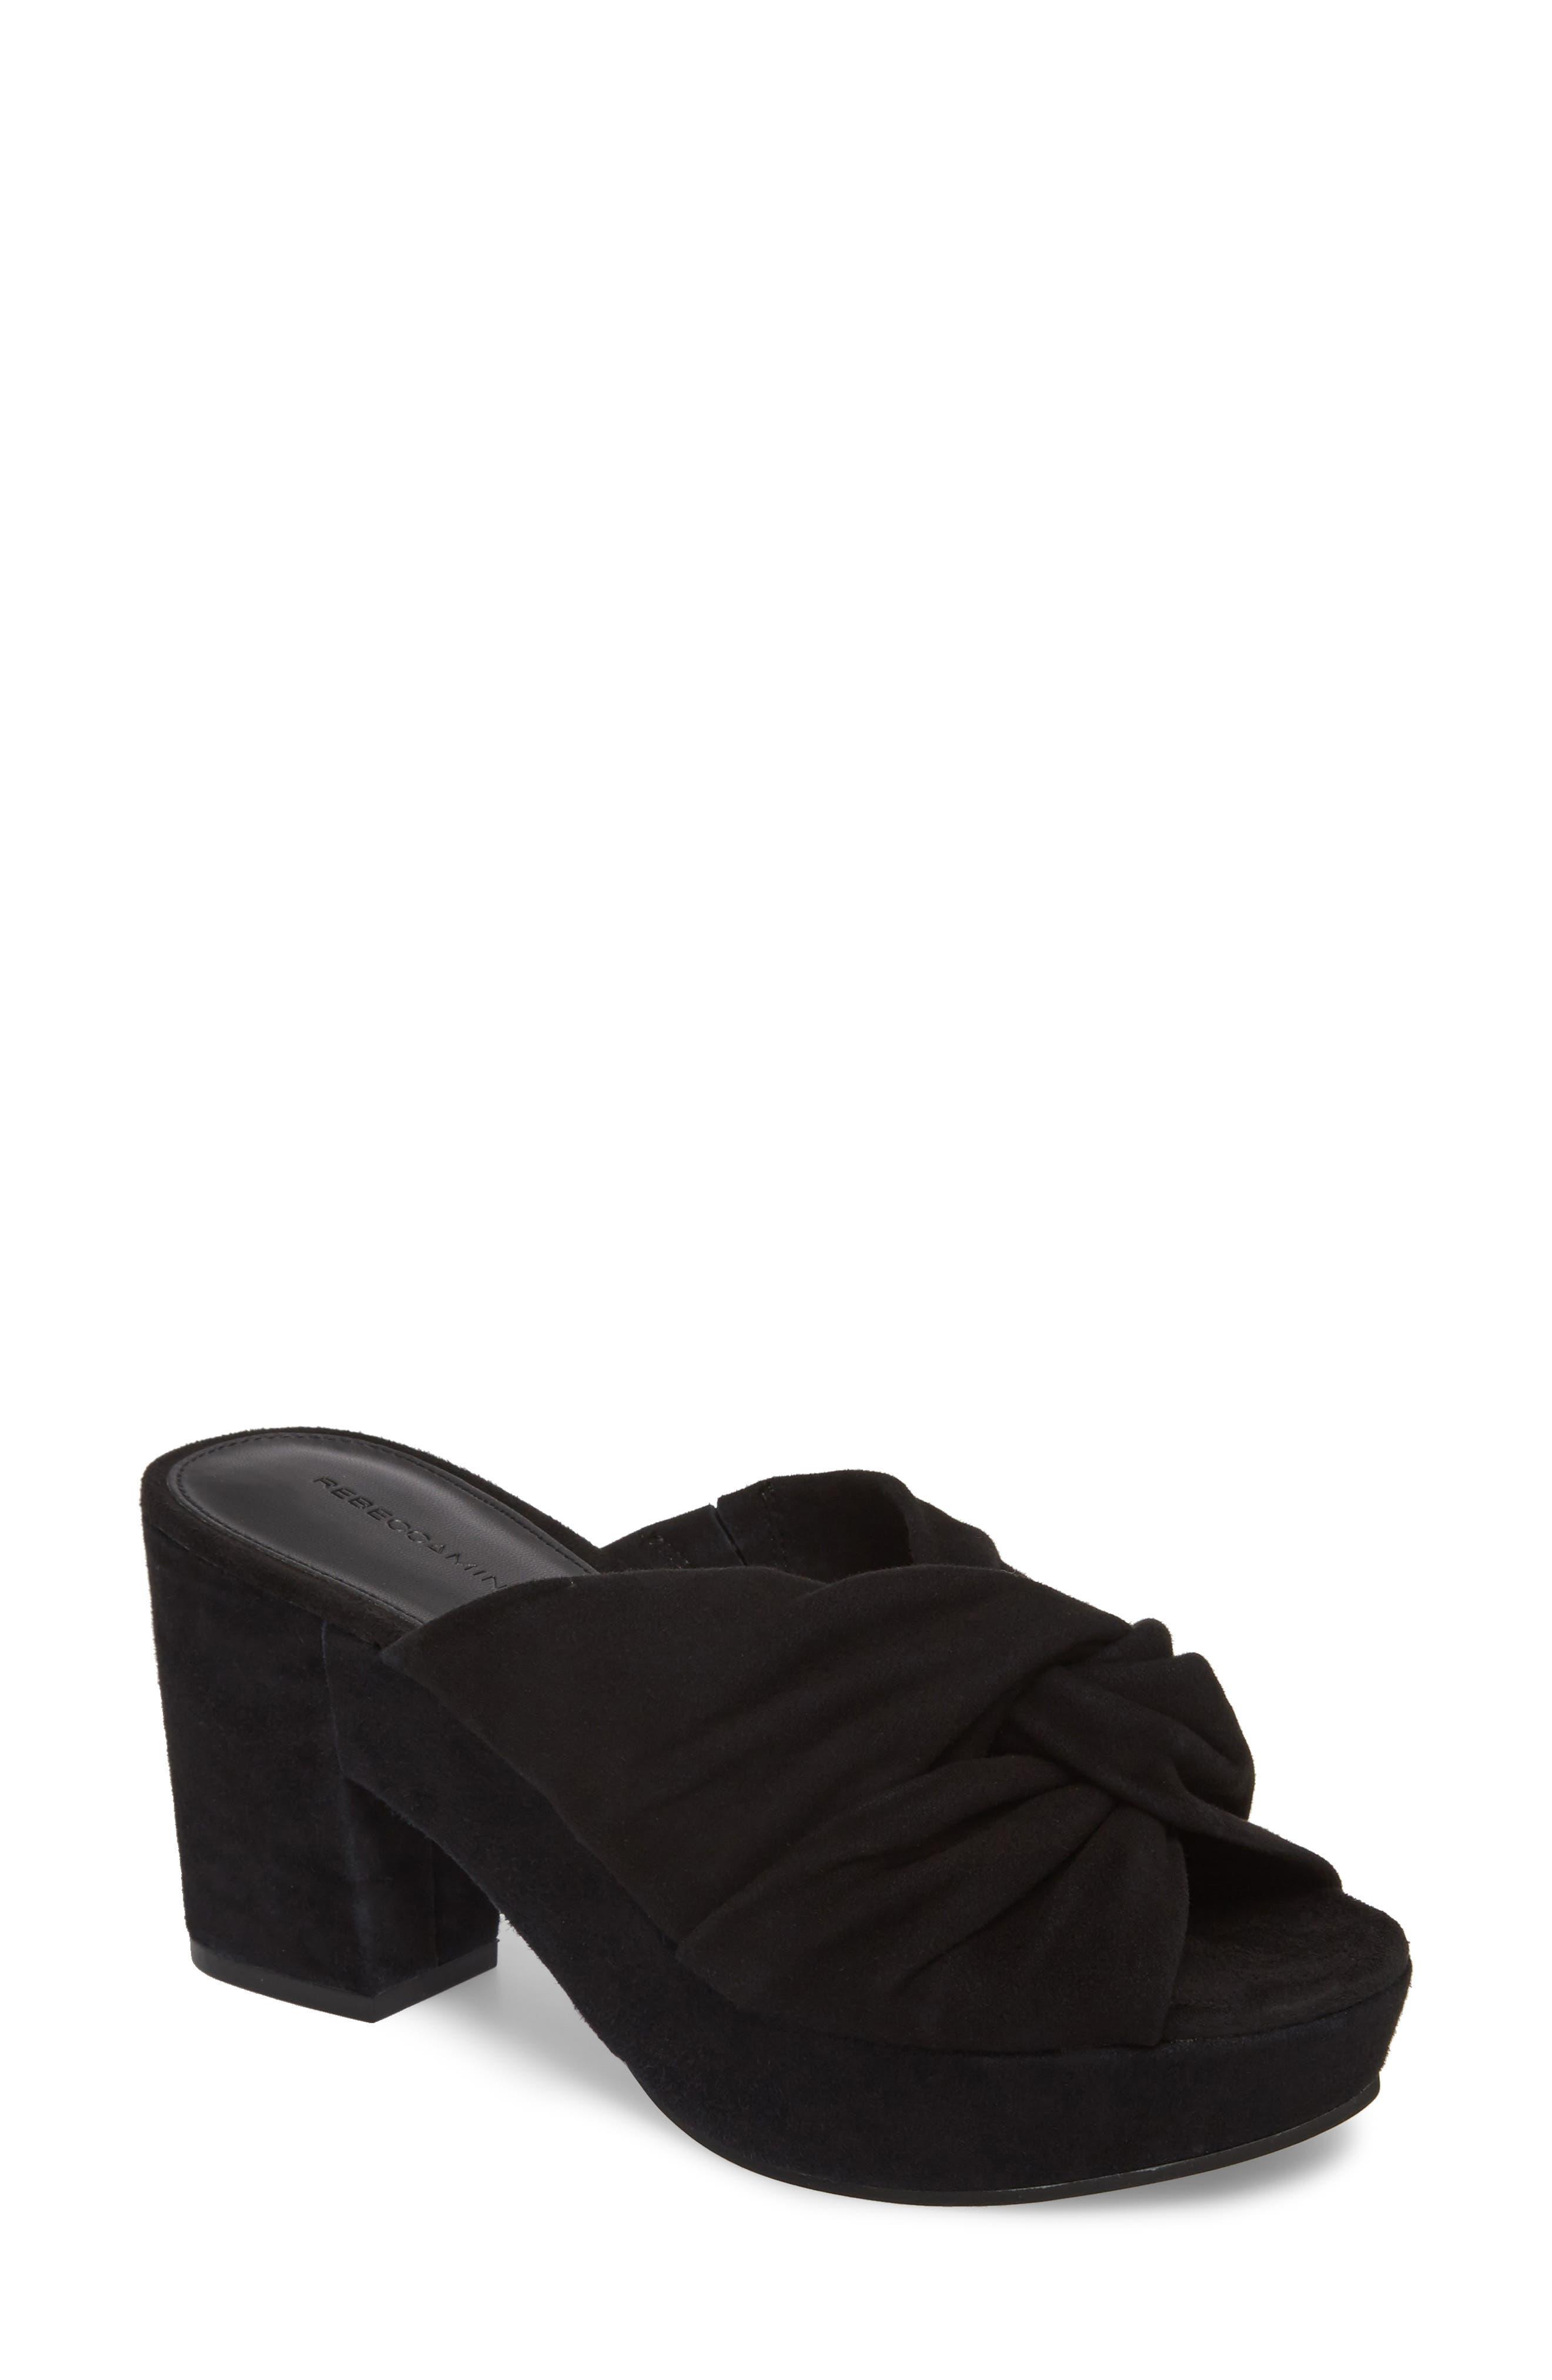 REBECCA MINKOFF,                             Jaden Slide Sandal,                             Main thumbnail 1, color,                             001